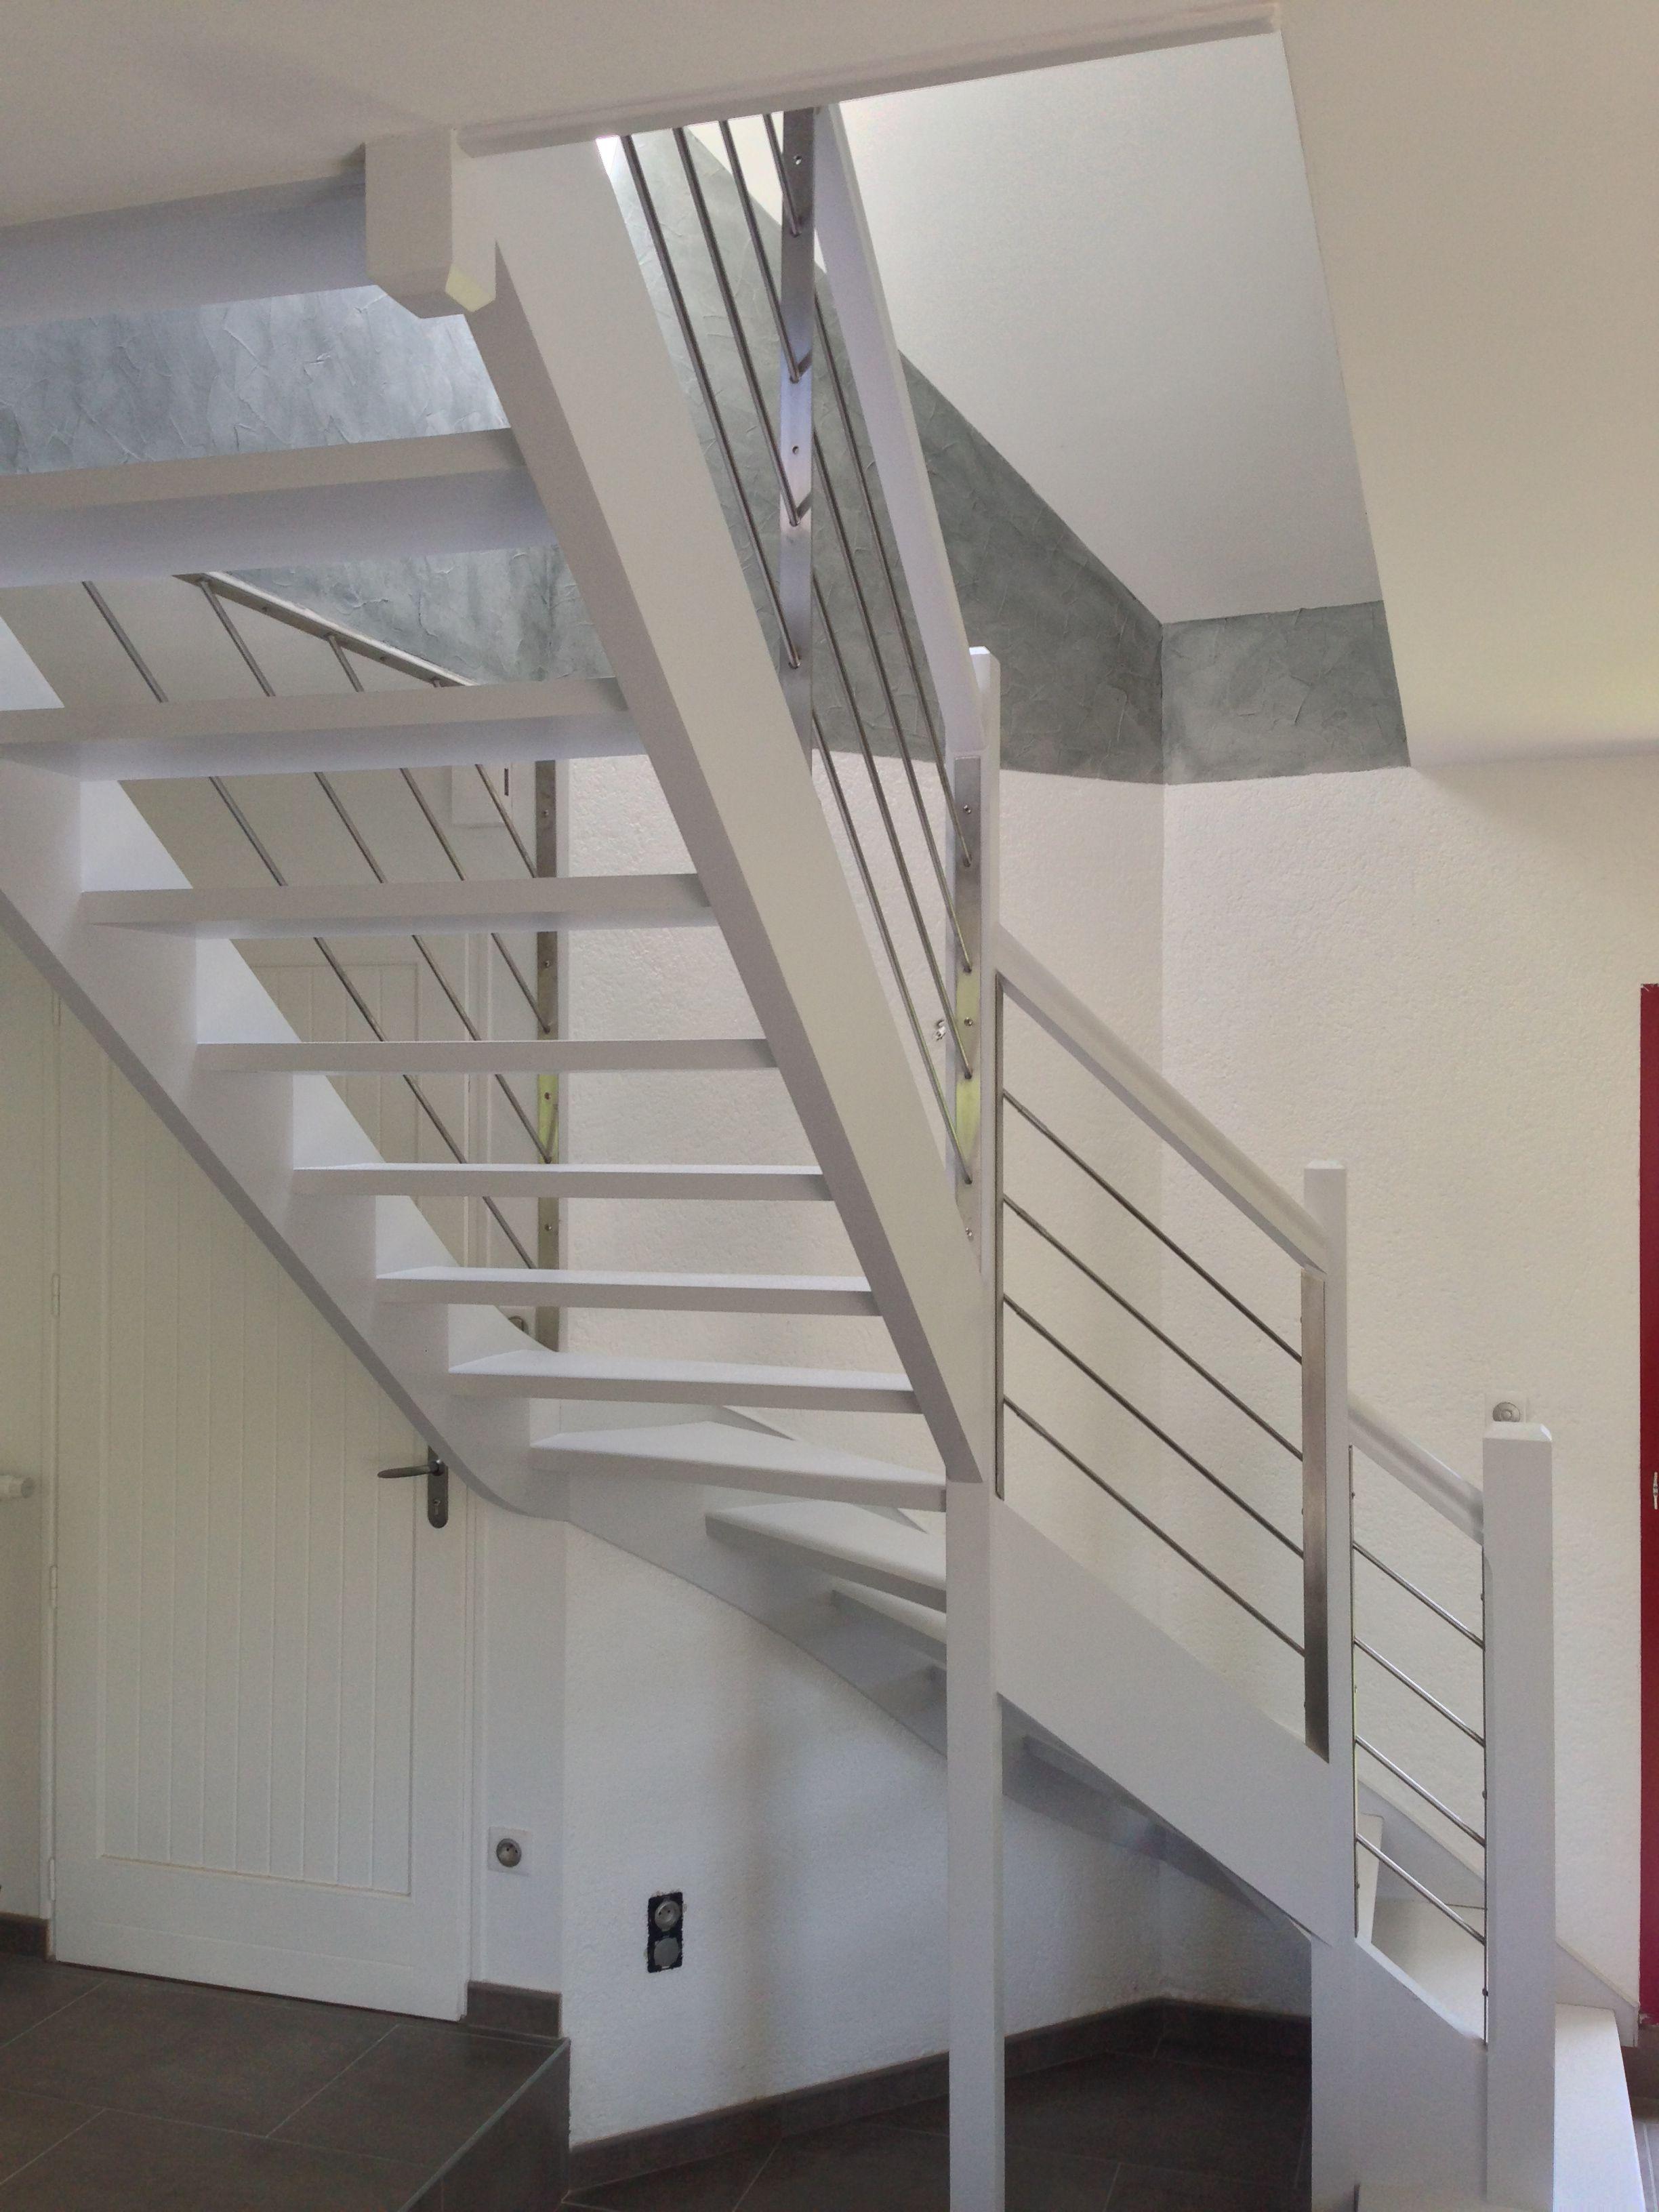 Garde Corps Bois Inox Art Metal Concept Quimper Http Artmetalconcept E Monsite Com Album Garde Corps Staircase Handrail Staircase Stairs